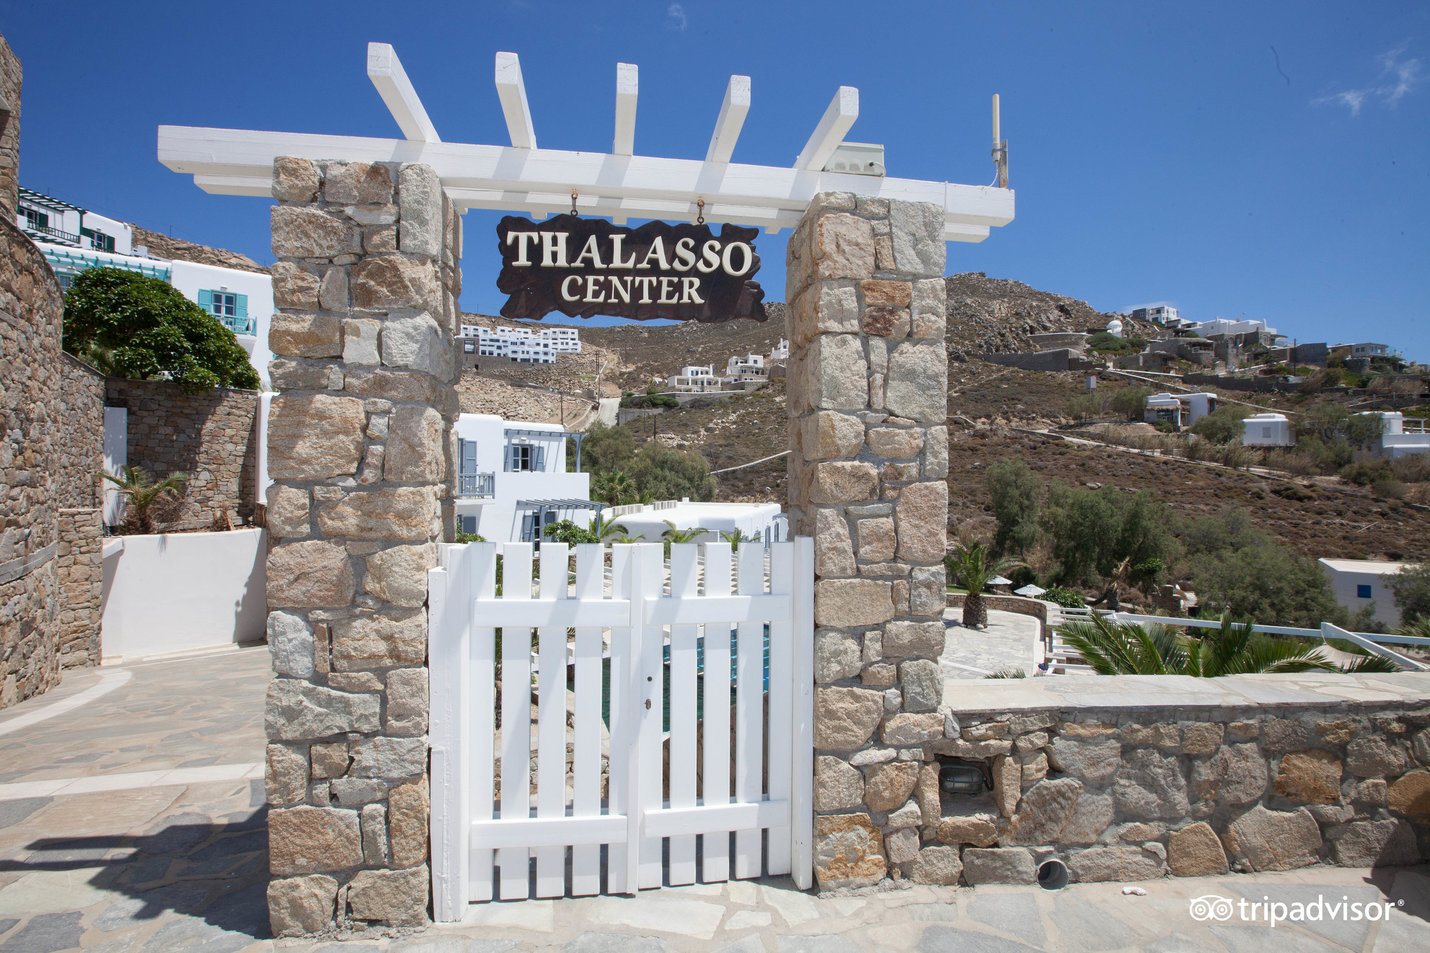 Thalasso center